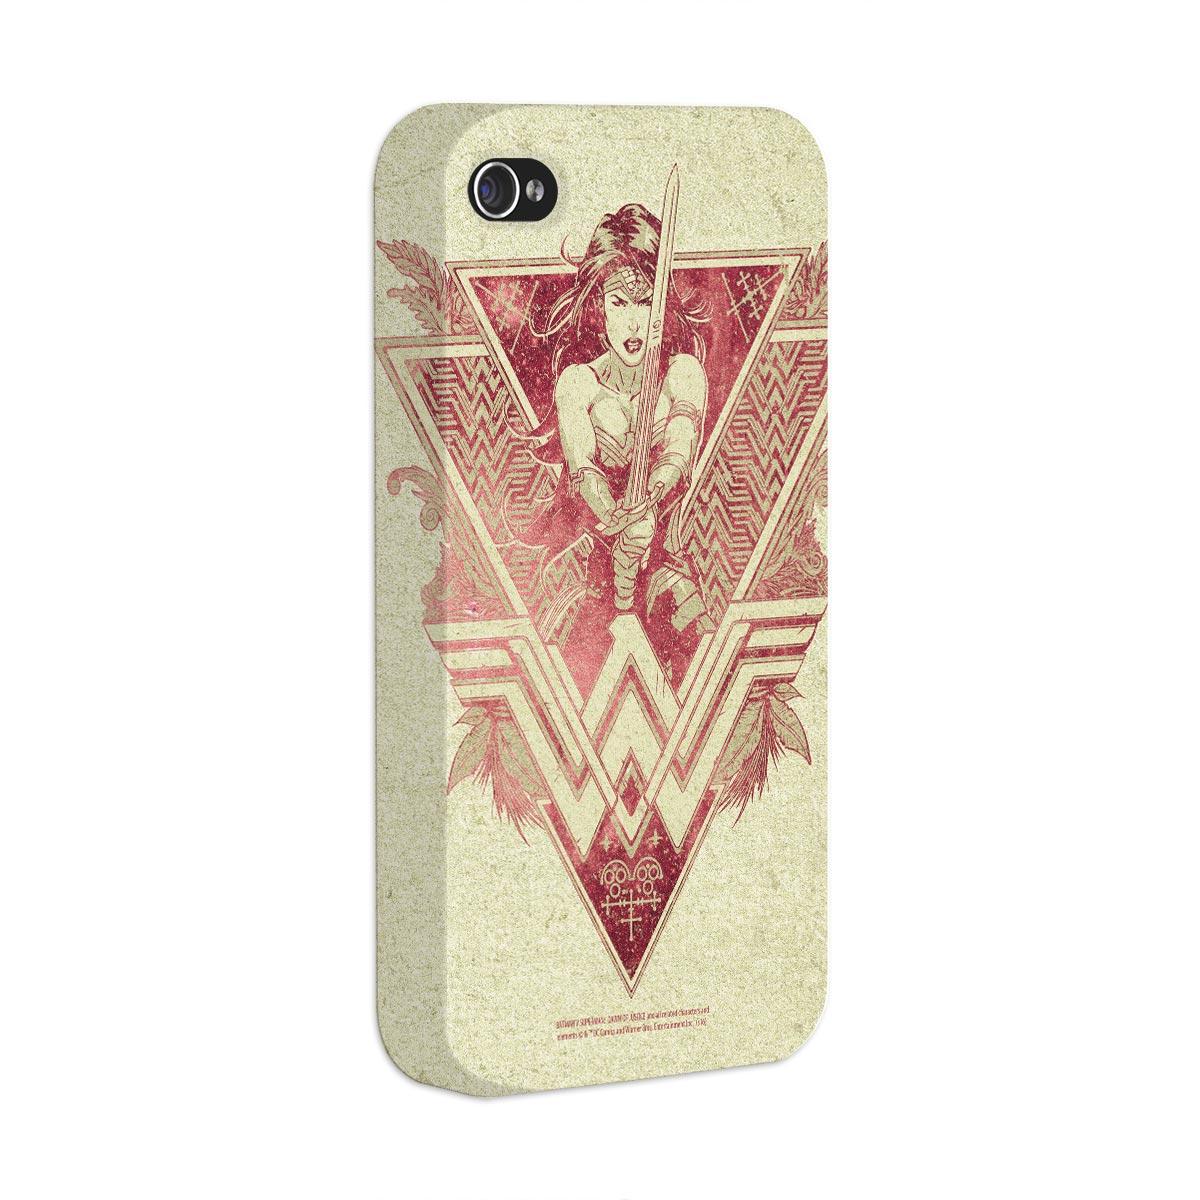 Capa para iPhone 4/4S Wonder Woman Warrior